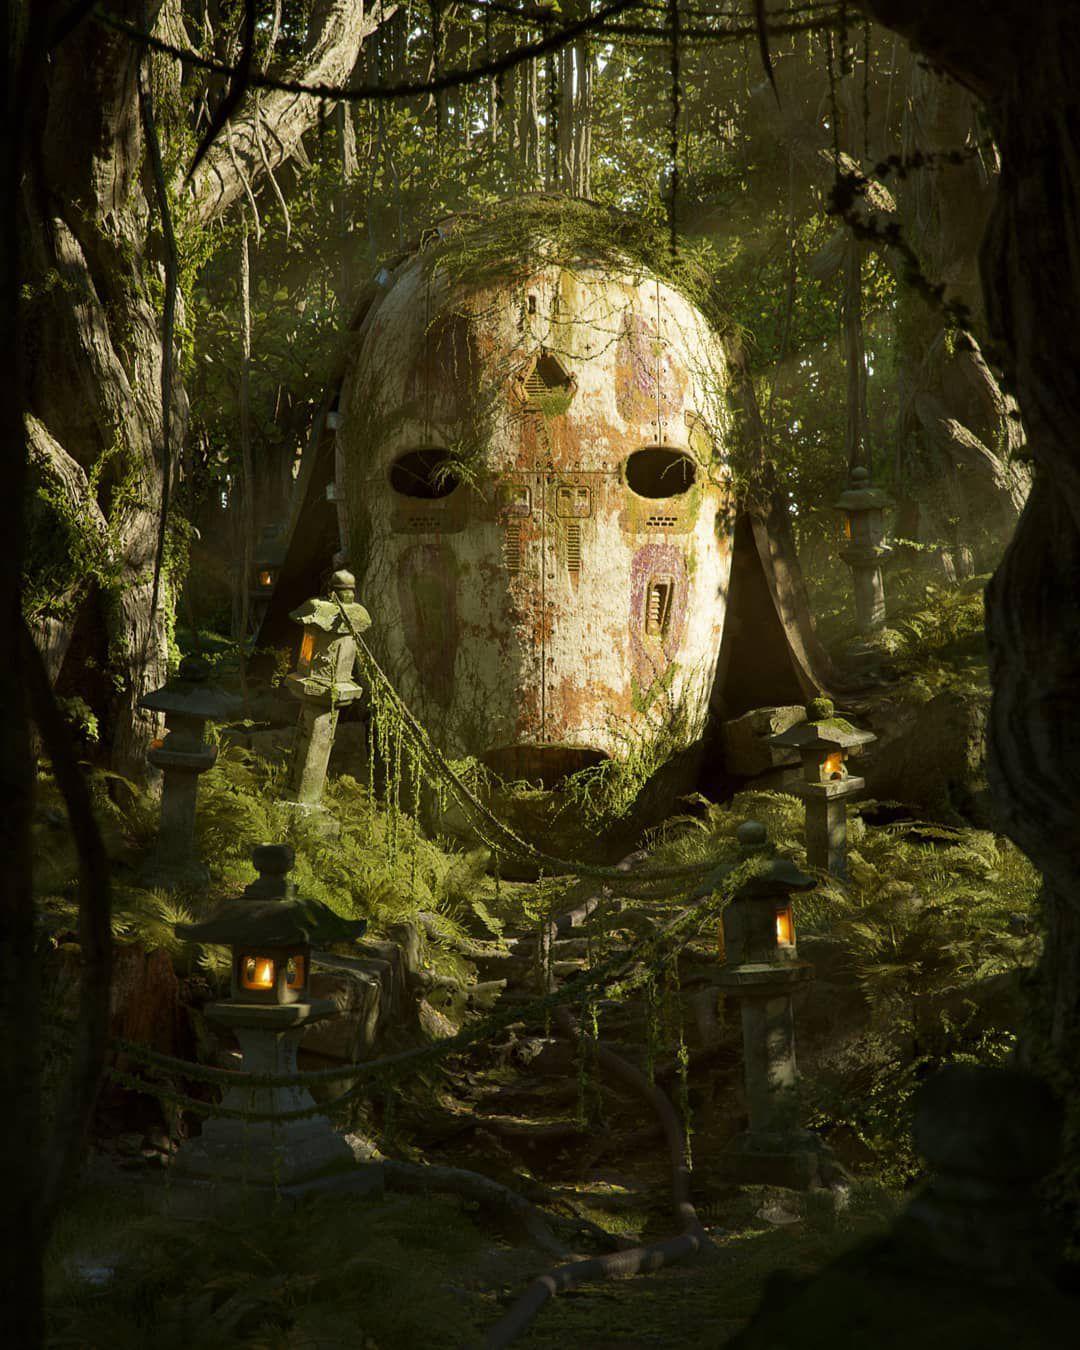 filip hodas artworks pop culture voyage de chihiro sans visage miyazaki